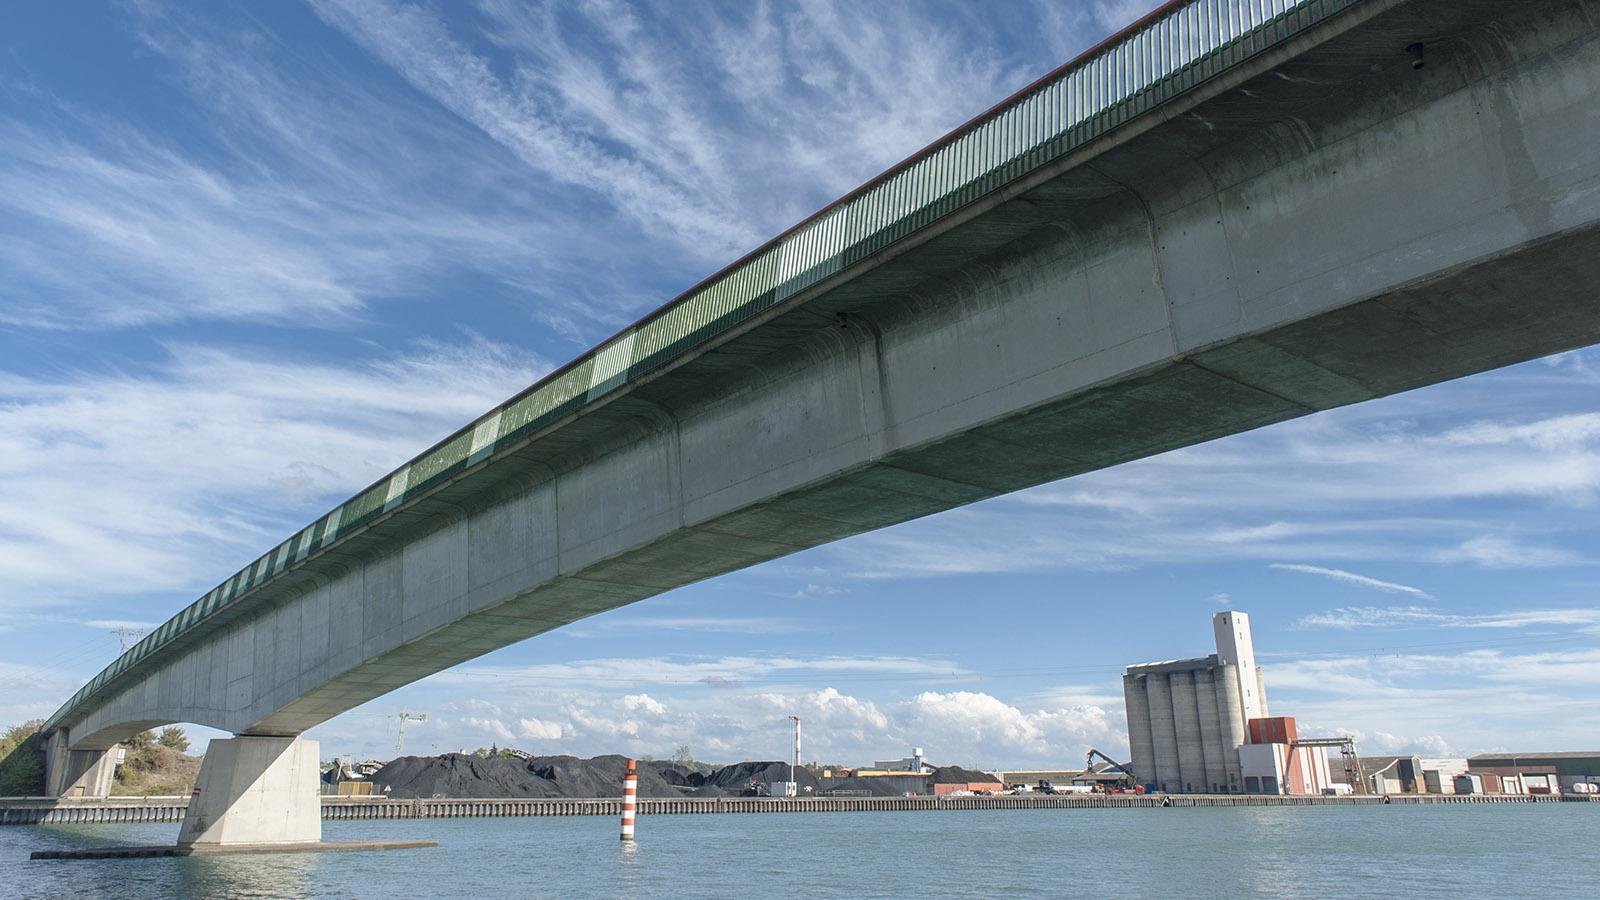 Die Rhônebrücke bei Saint-Pierre de Boeuf. Foto: Hilke Maunder